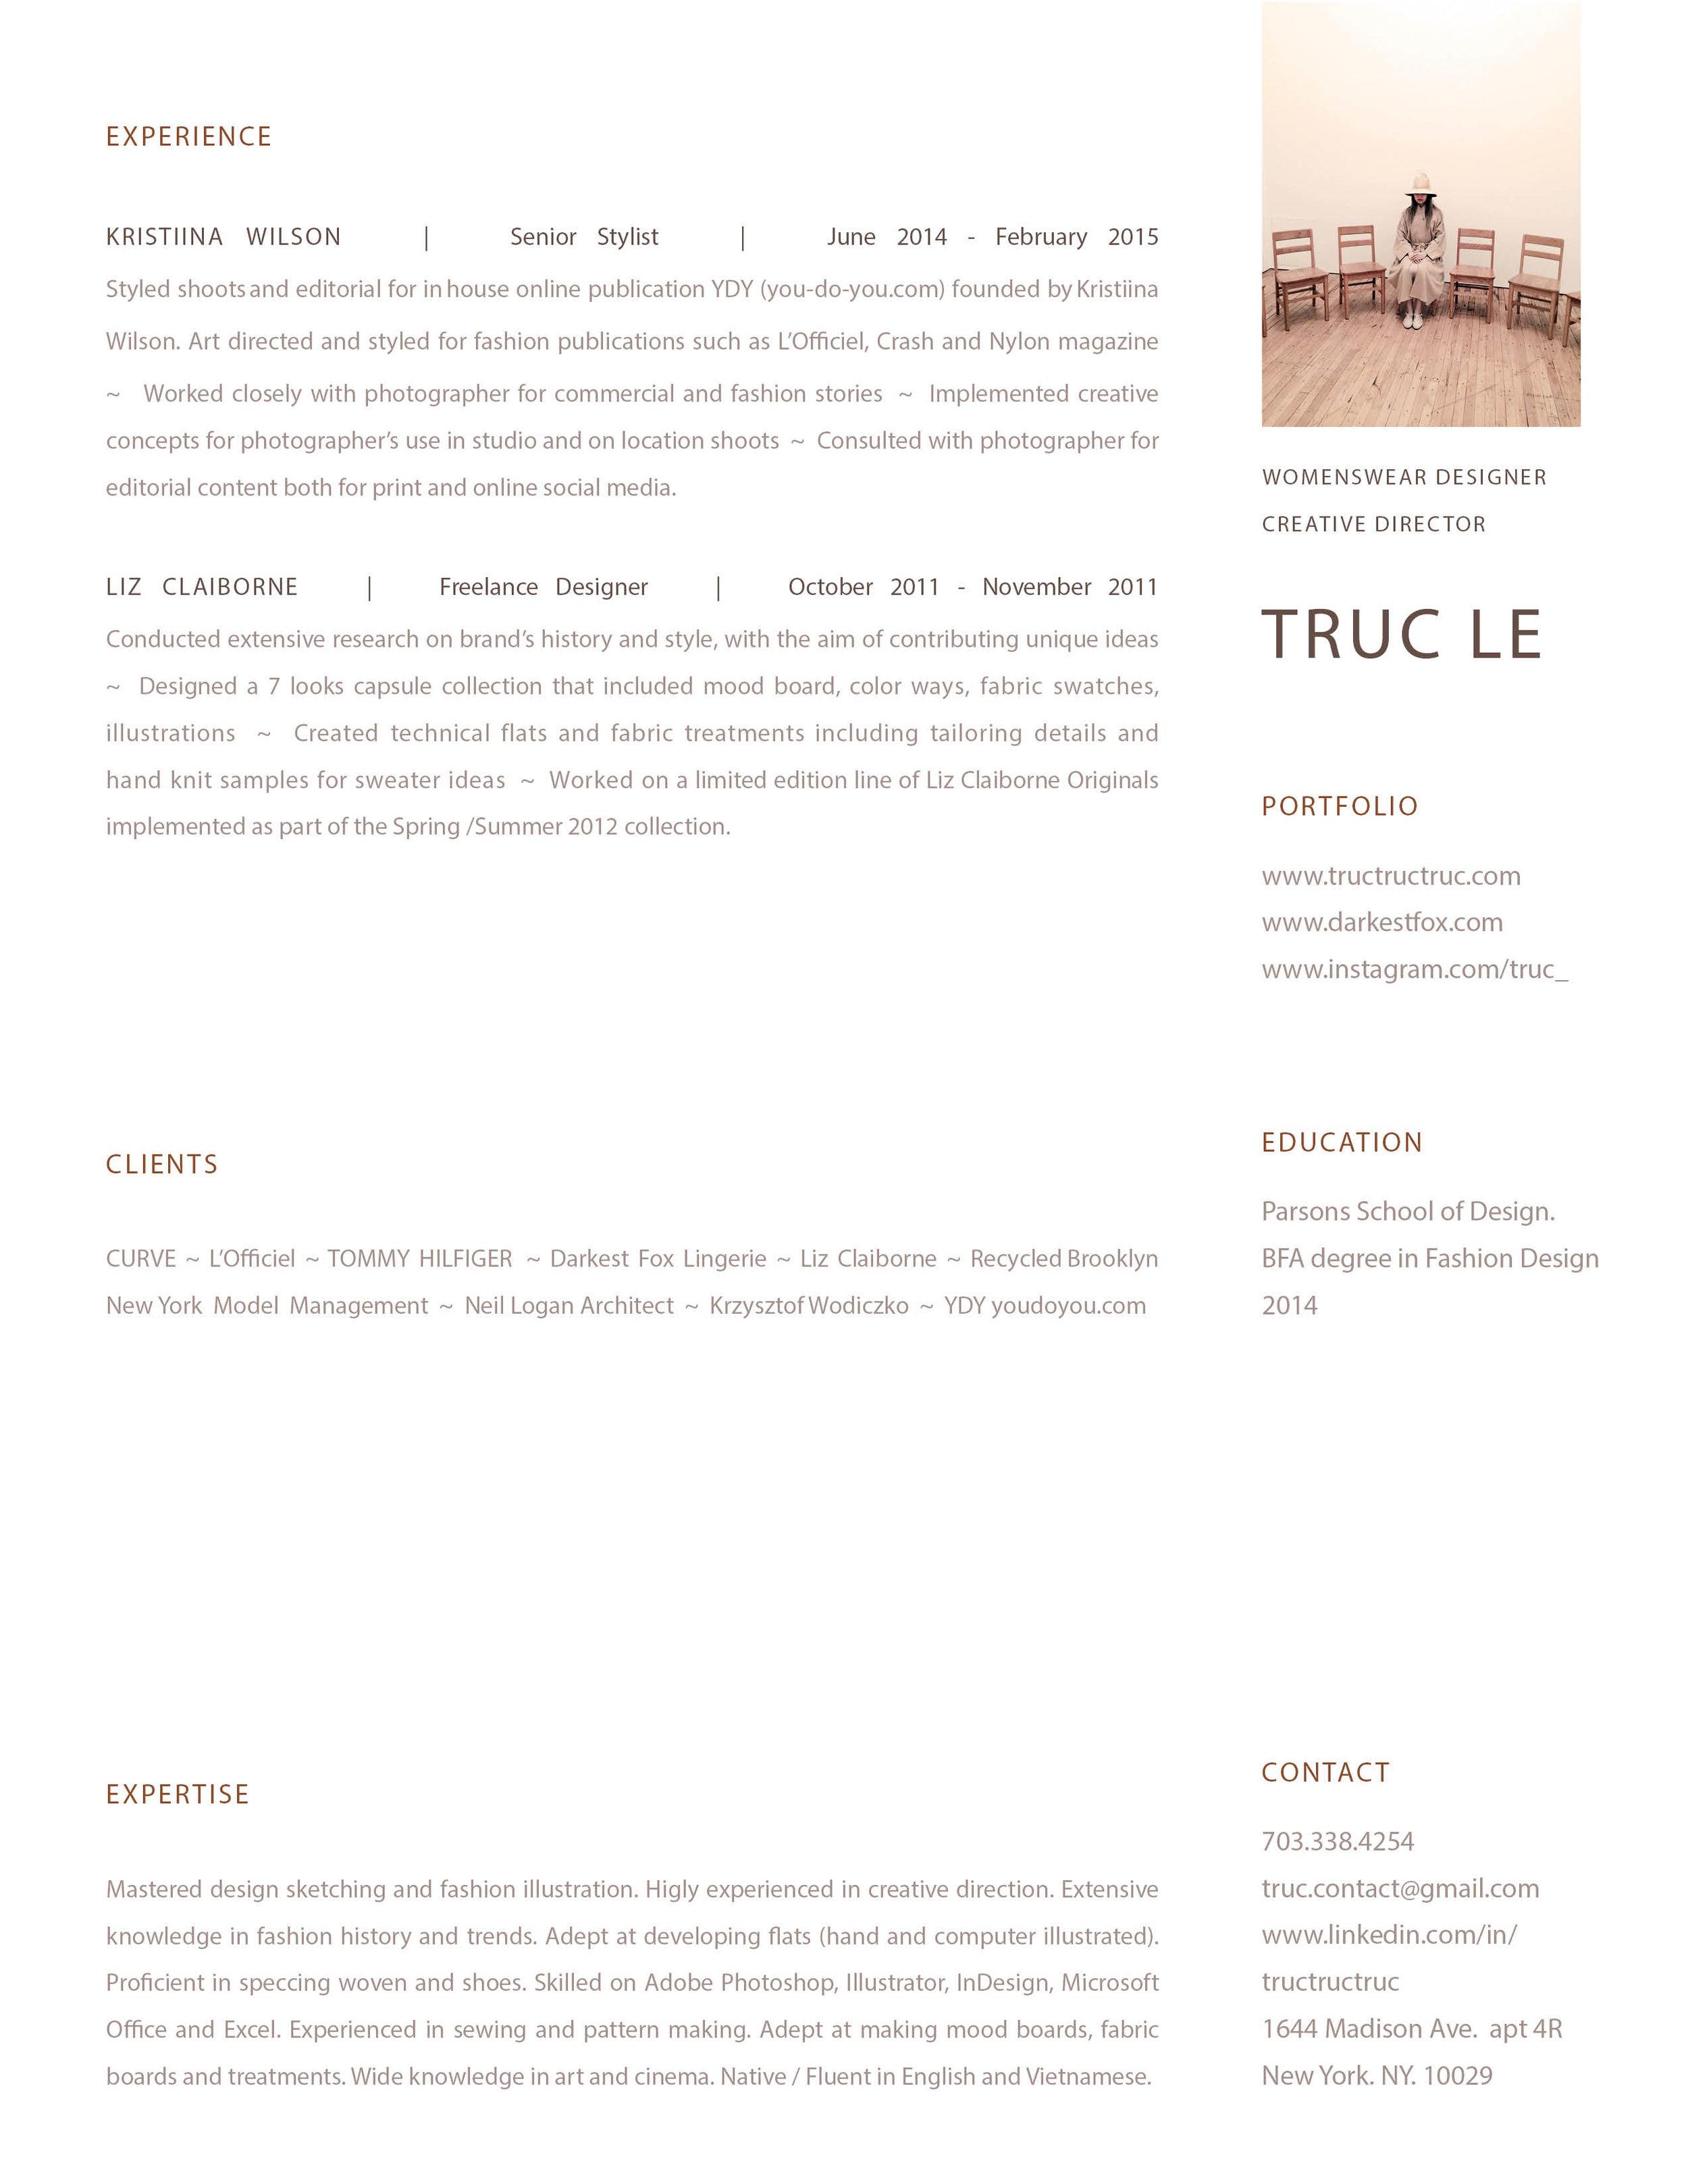 TRUC_Design_Resume_20192.jpg